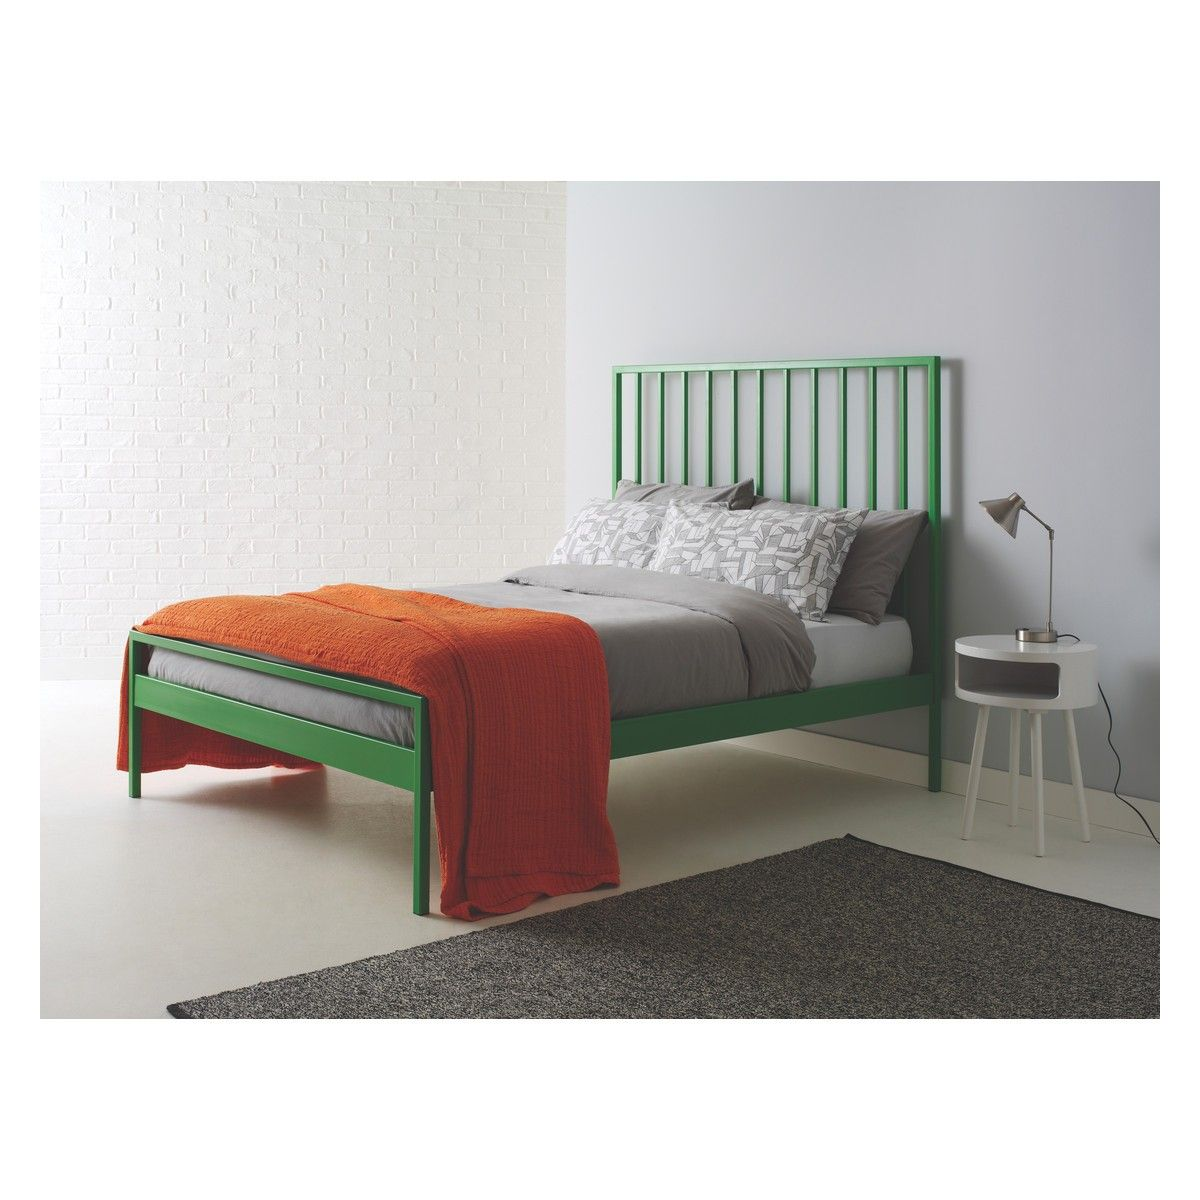 Washed Neutral Stonewashed Kingsize Duvet Cover Buy Now At Habitat Uk Spare Bedroom Bed